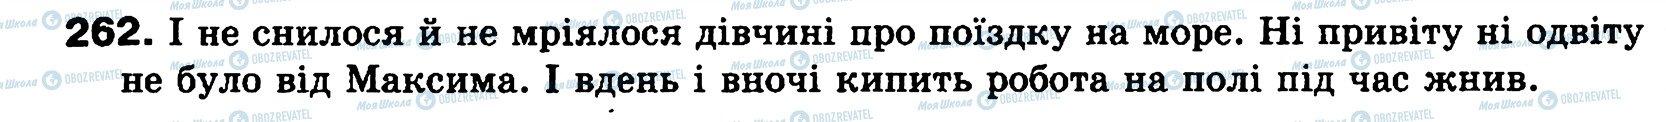 ГДЗ Укр мова 8 класс страница 262